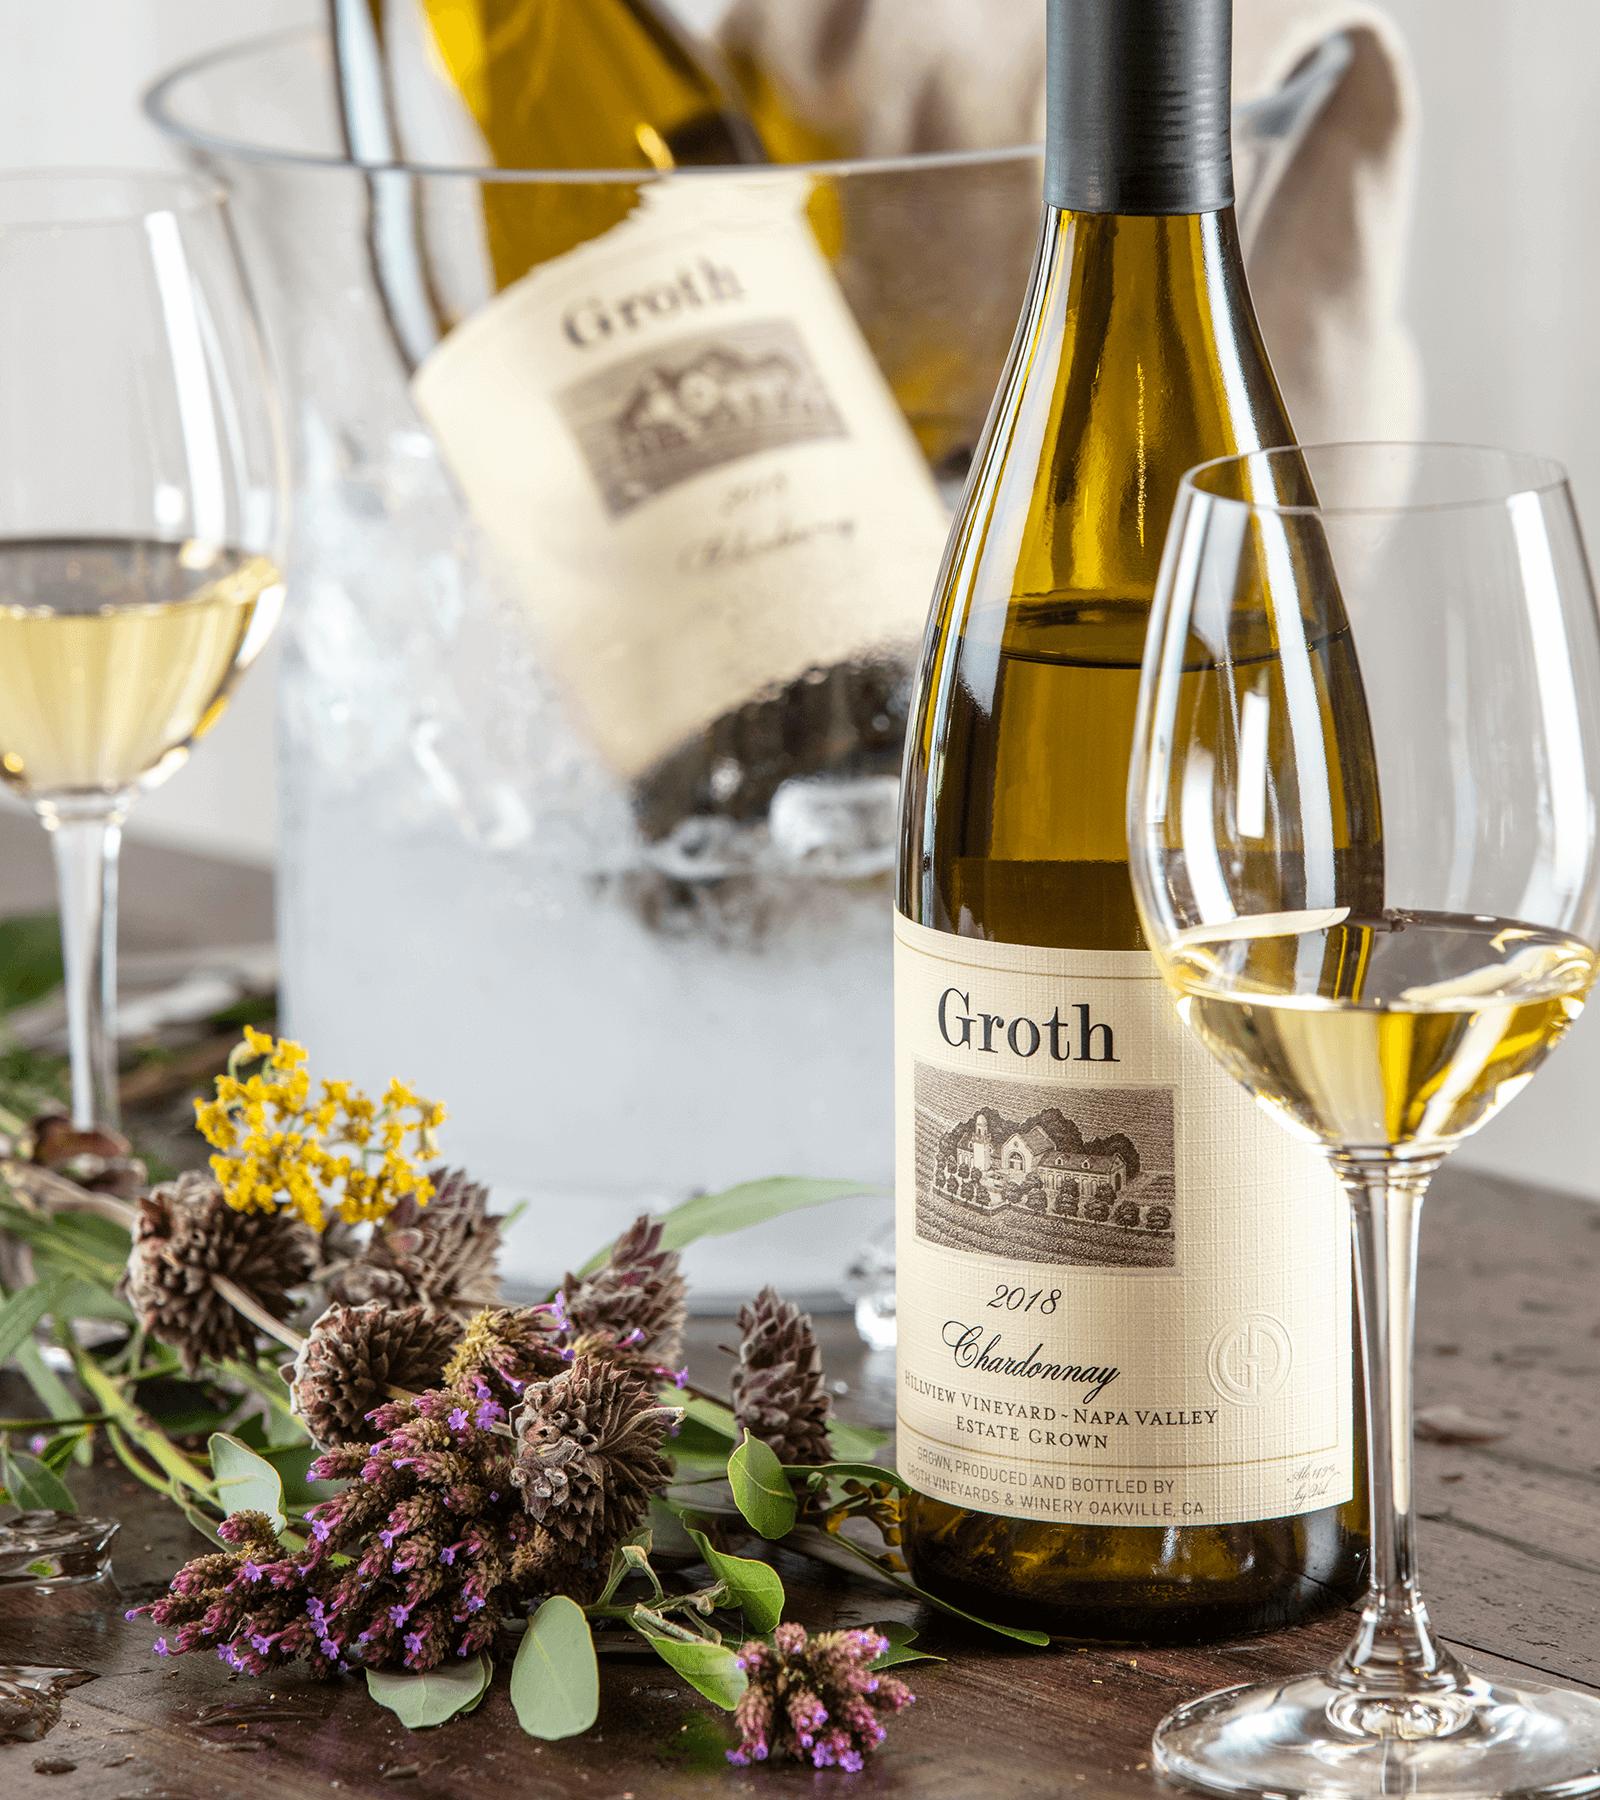 2018 Chardonnay, Hillview Vineyard, Napa Valley